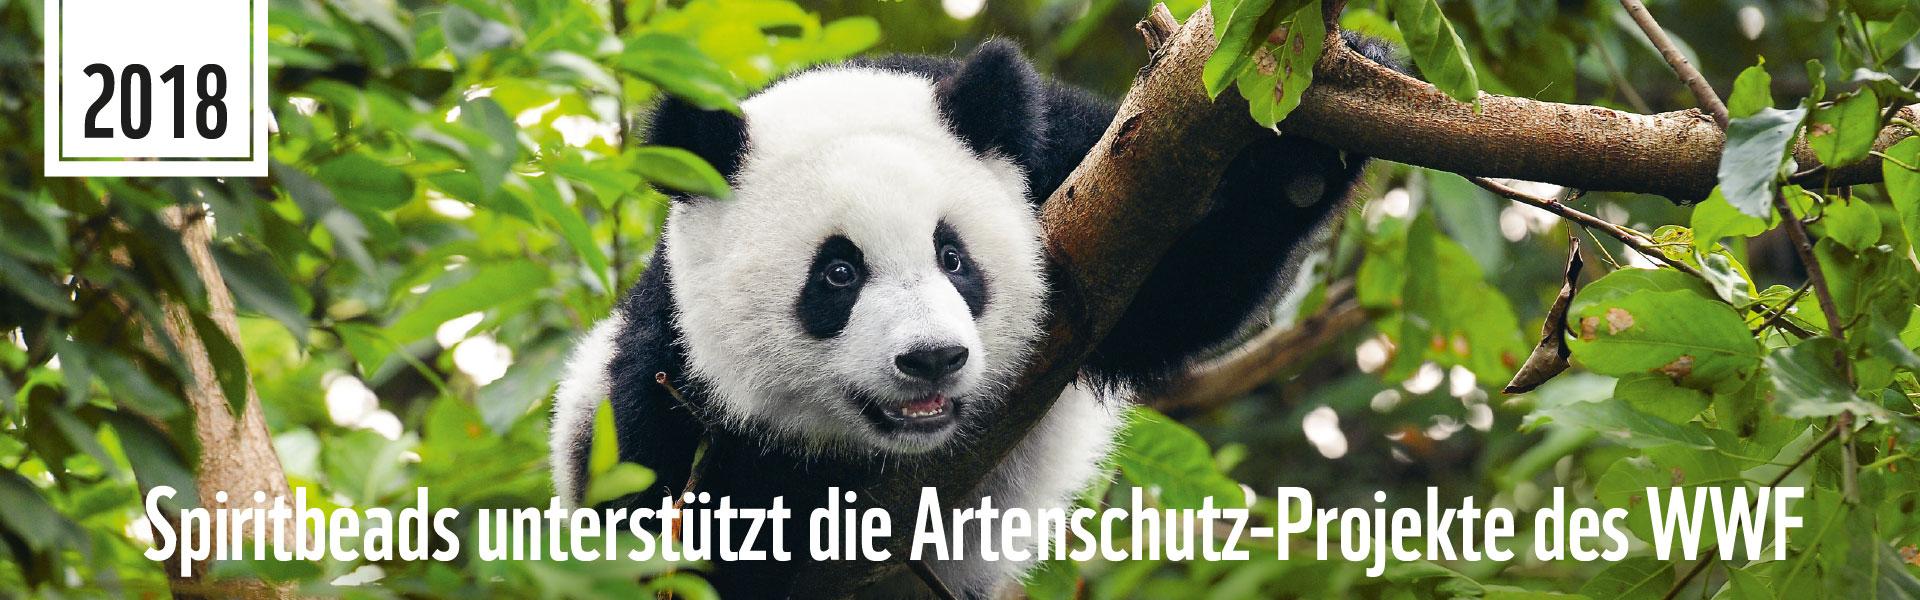 WWF-Banner_Spiritbeads